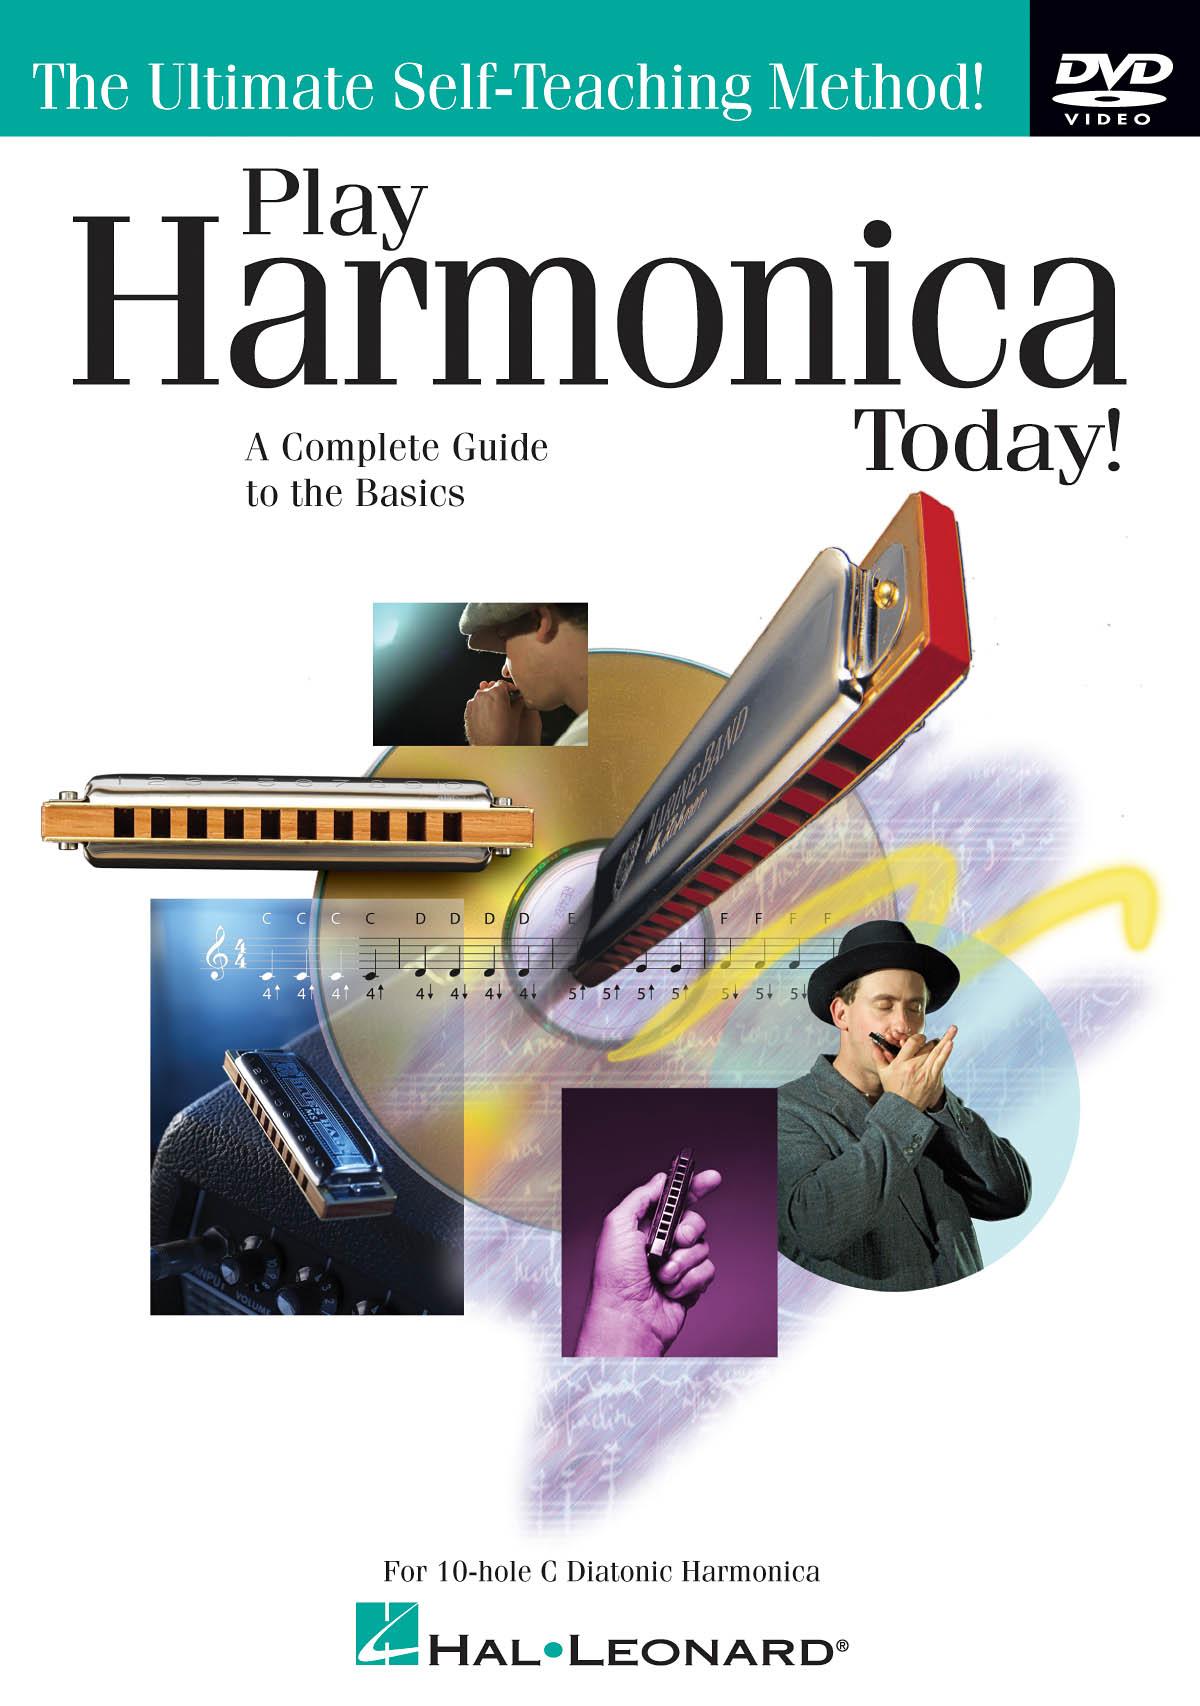 Play Harmonica Today!: Harmonica: Instrumental Tutor